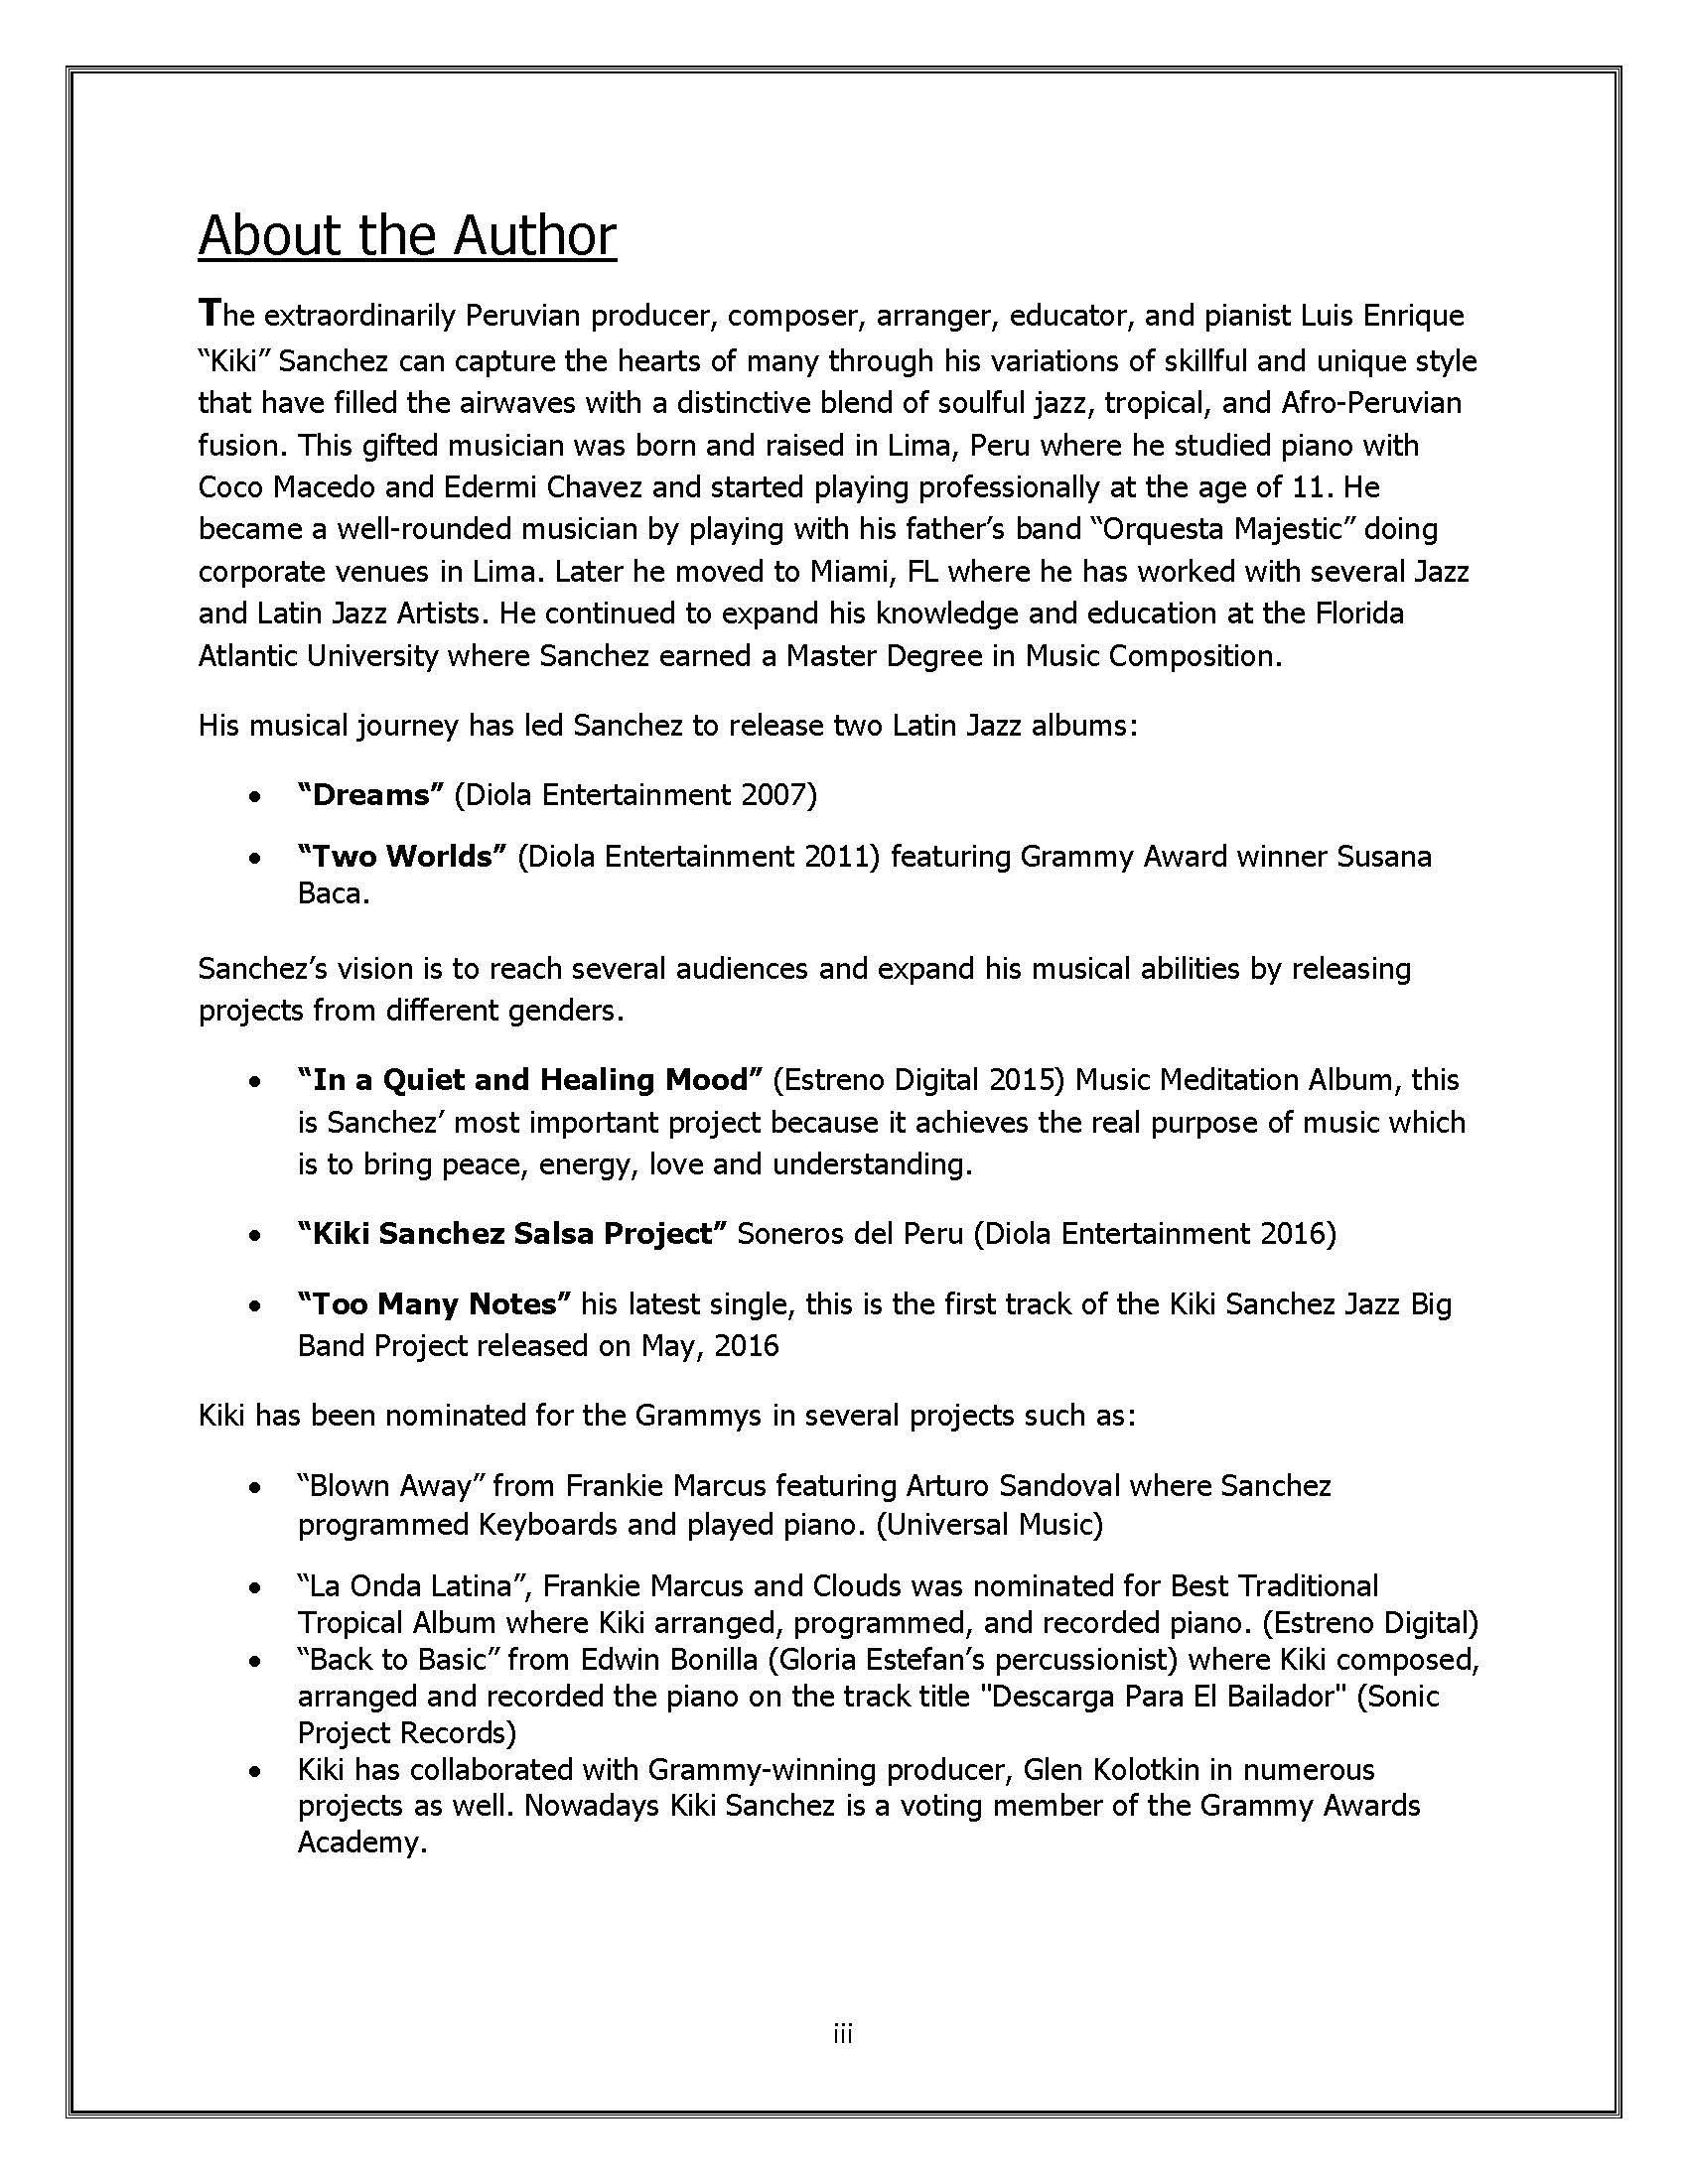 THE CONTEMPORARY MUSIC HARMONY BOOK: KIKI SANCHEZ: 9781532355479: Amazon.com: Books